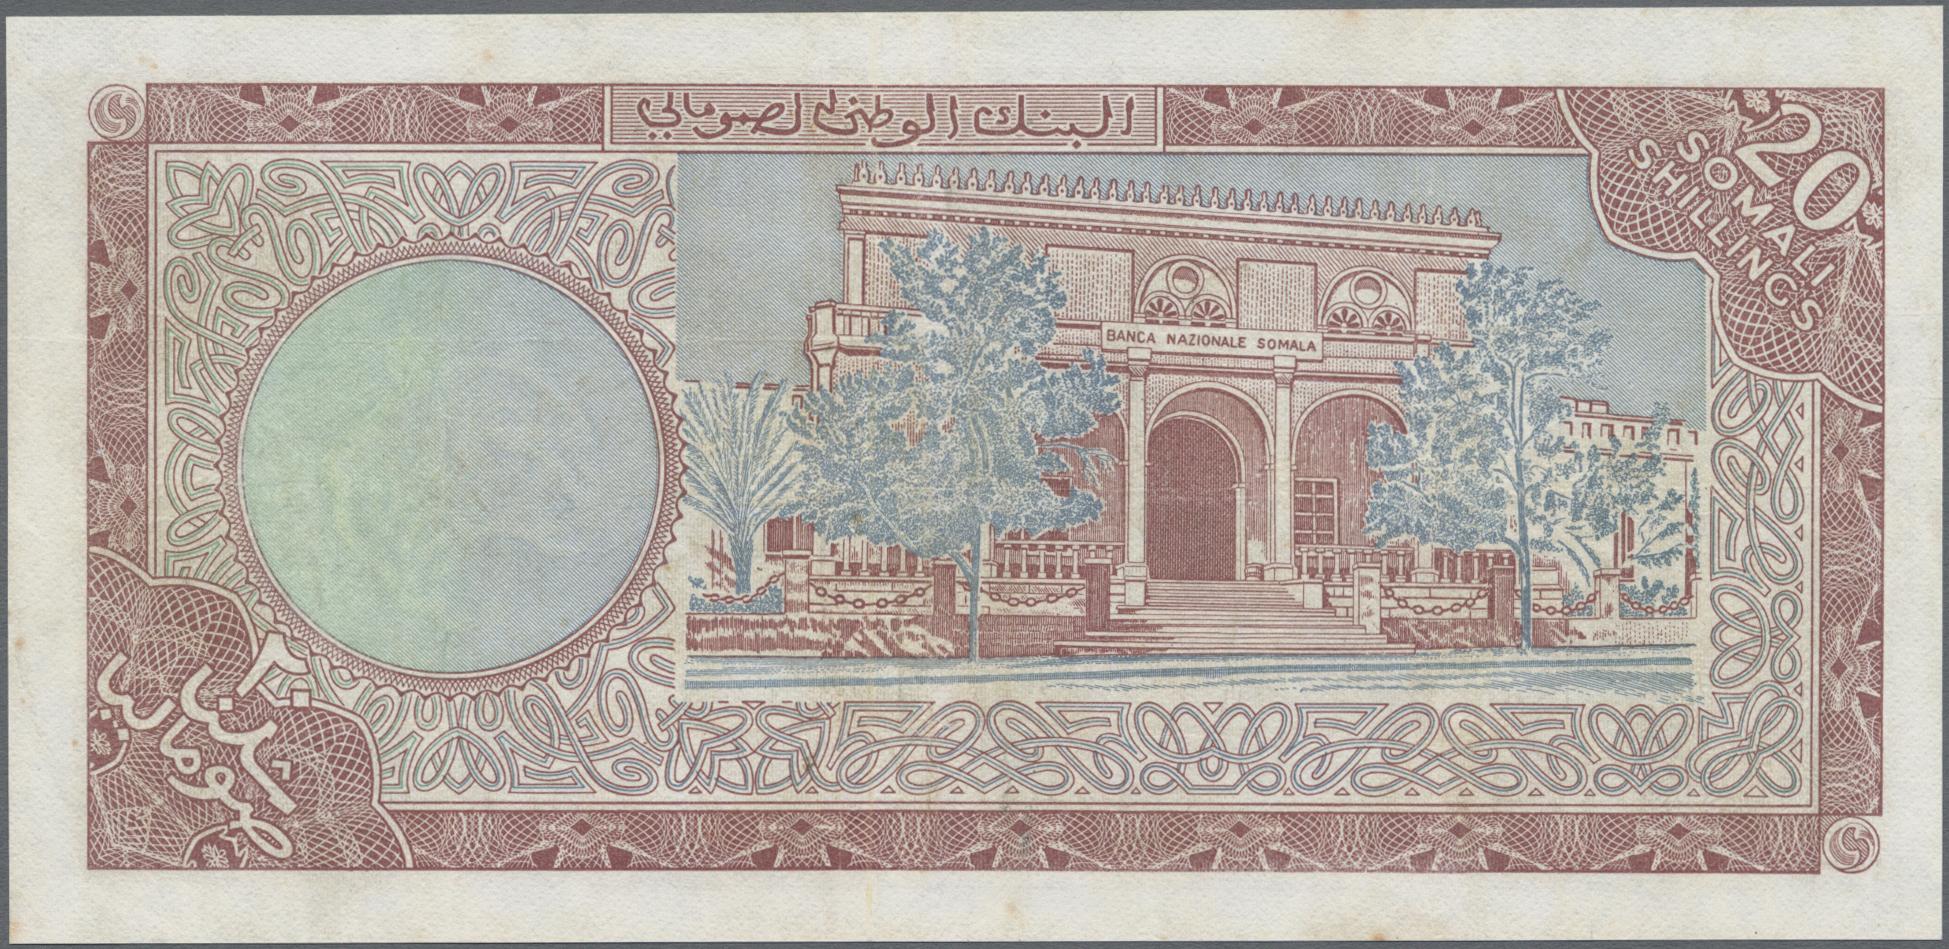 Lot 00838 - Somalia | Banknoten  -  Auktionshaus Christoph Gärtner GmbH & Co. KG Sale #48 The Banknotes